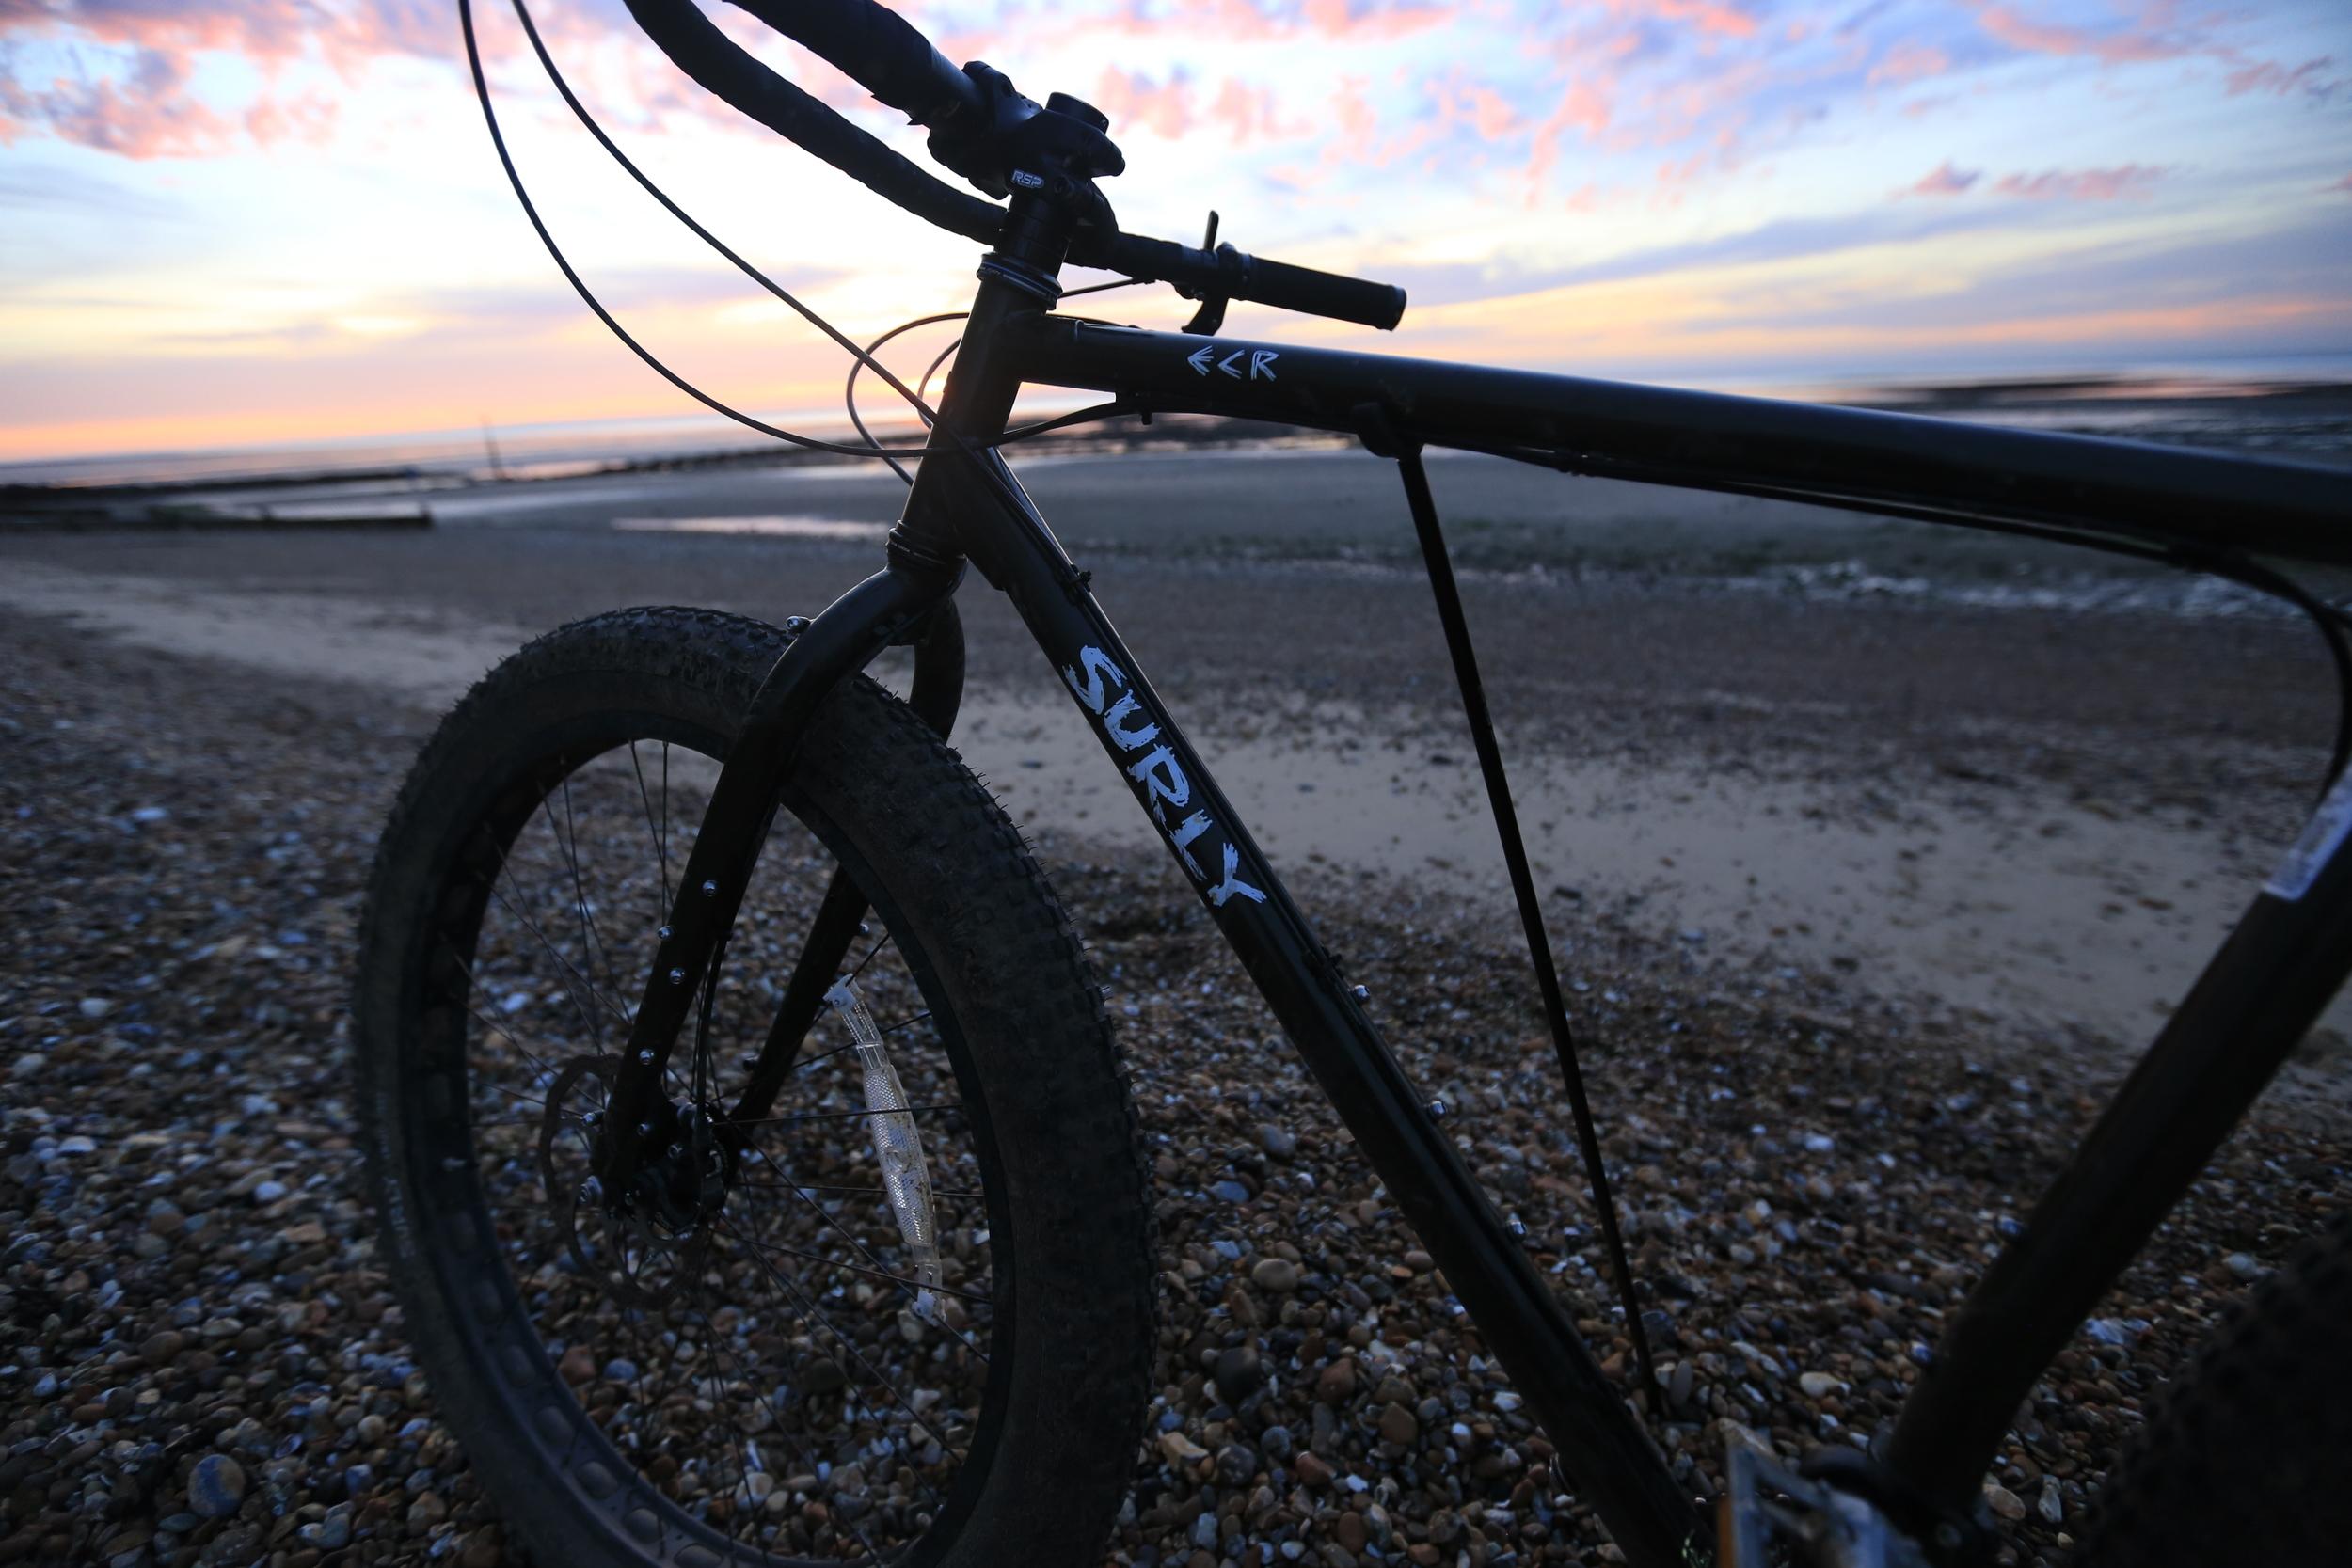 surly, surly ecr, ecr, bikepacking, gear review, cycling blog, 29er, fat bike, fat bike blog, bicycle touring apocalypse